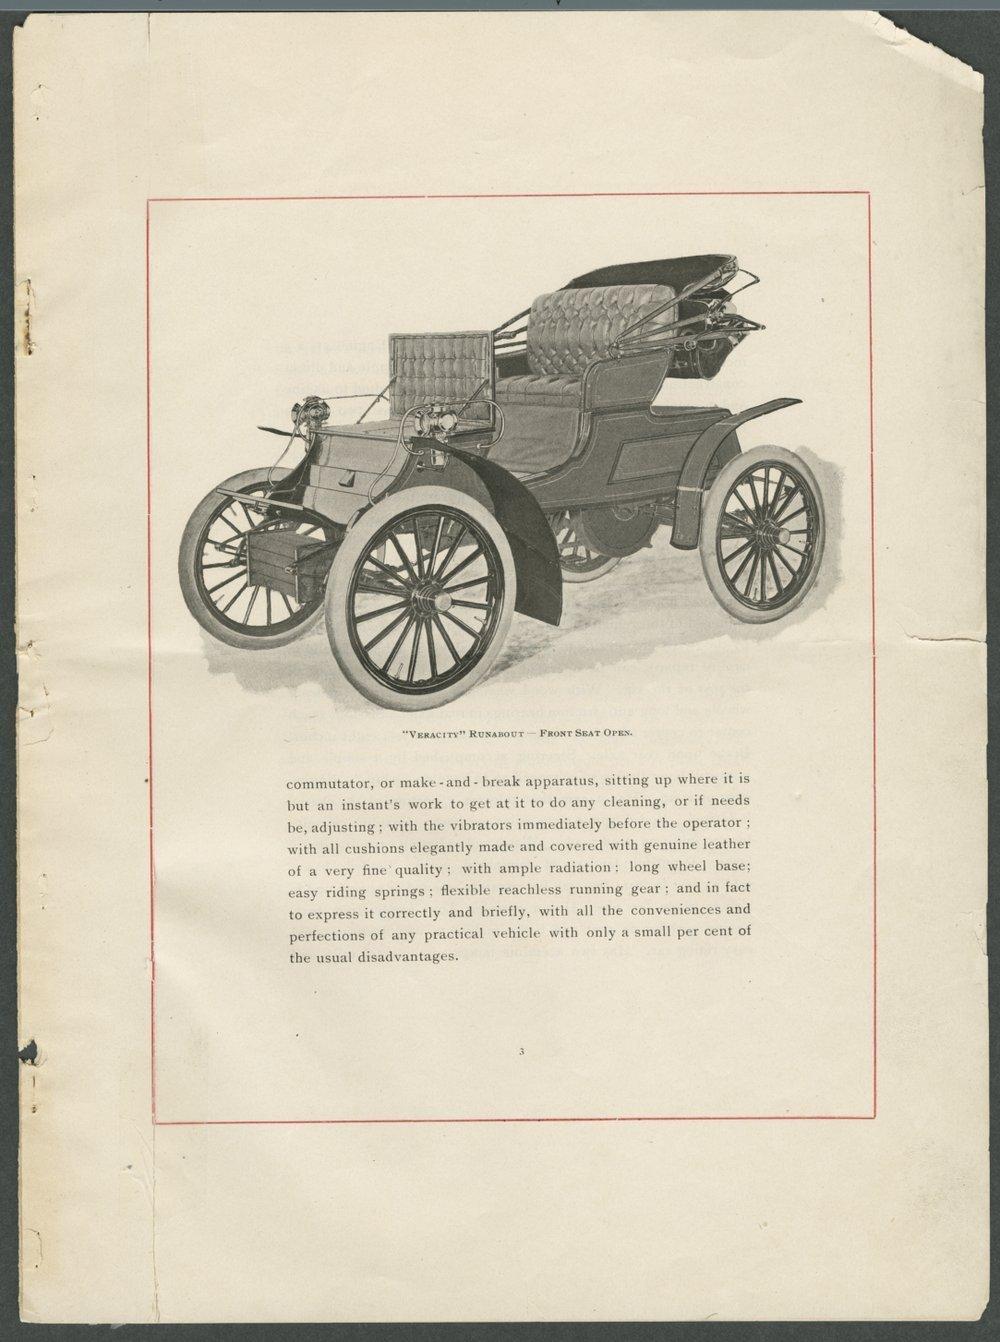 Veracity automobiles. Smith Automobile Company, Topeka, Kansas - 3